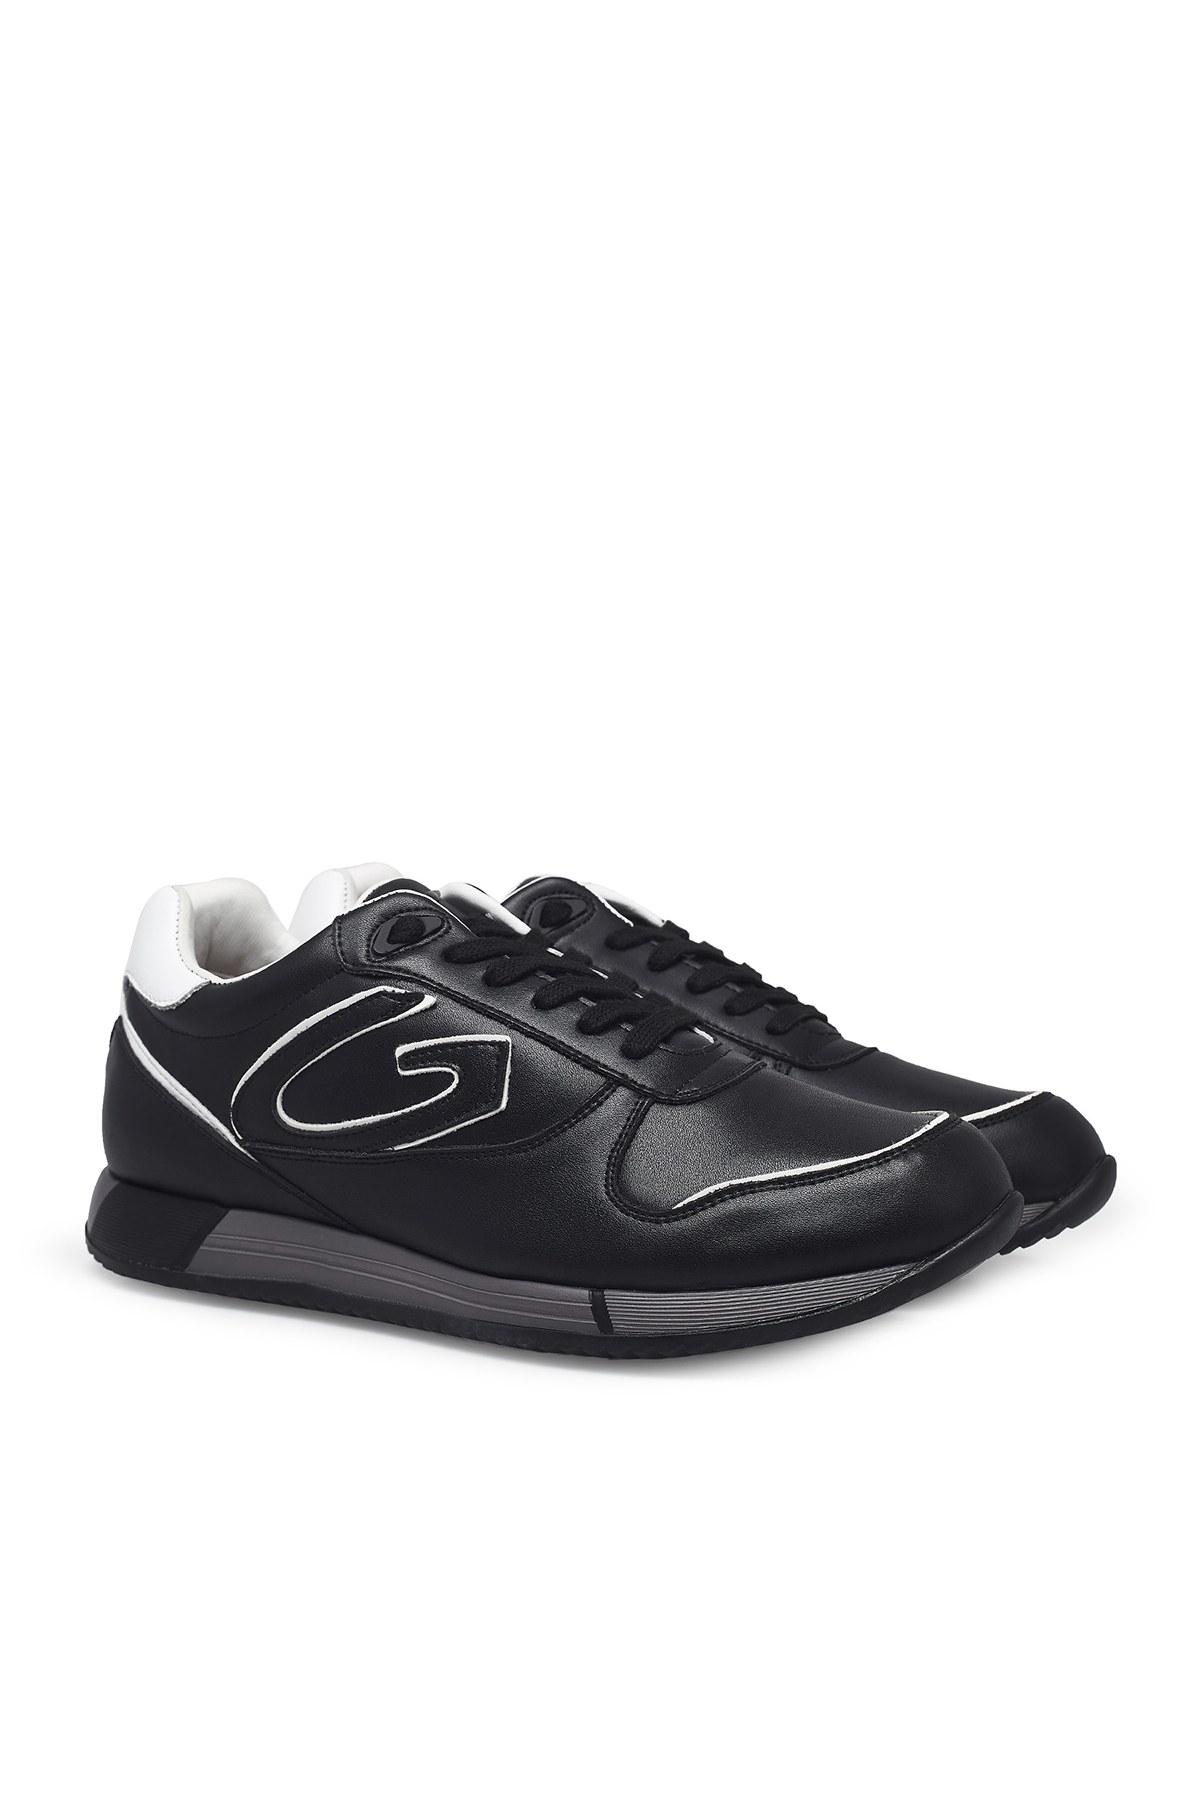 Alberto Guardiani Deri Erkek Ayakkabı AGM002301 SİYAH